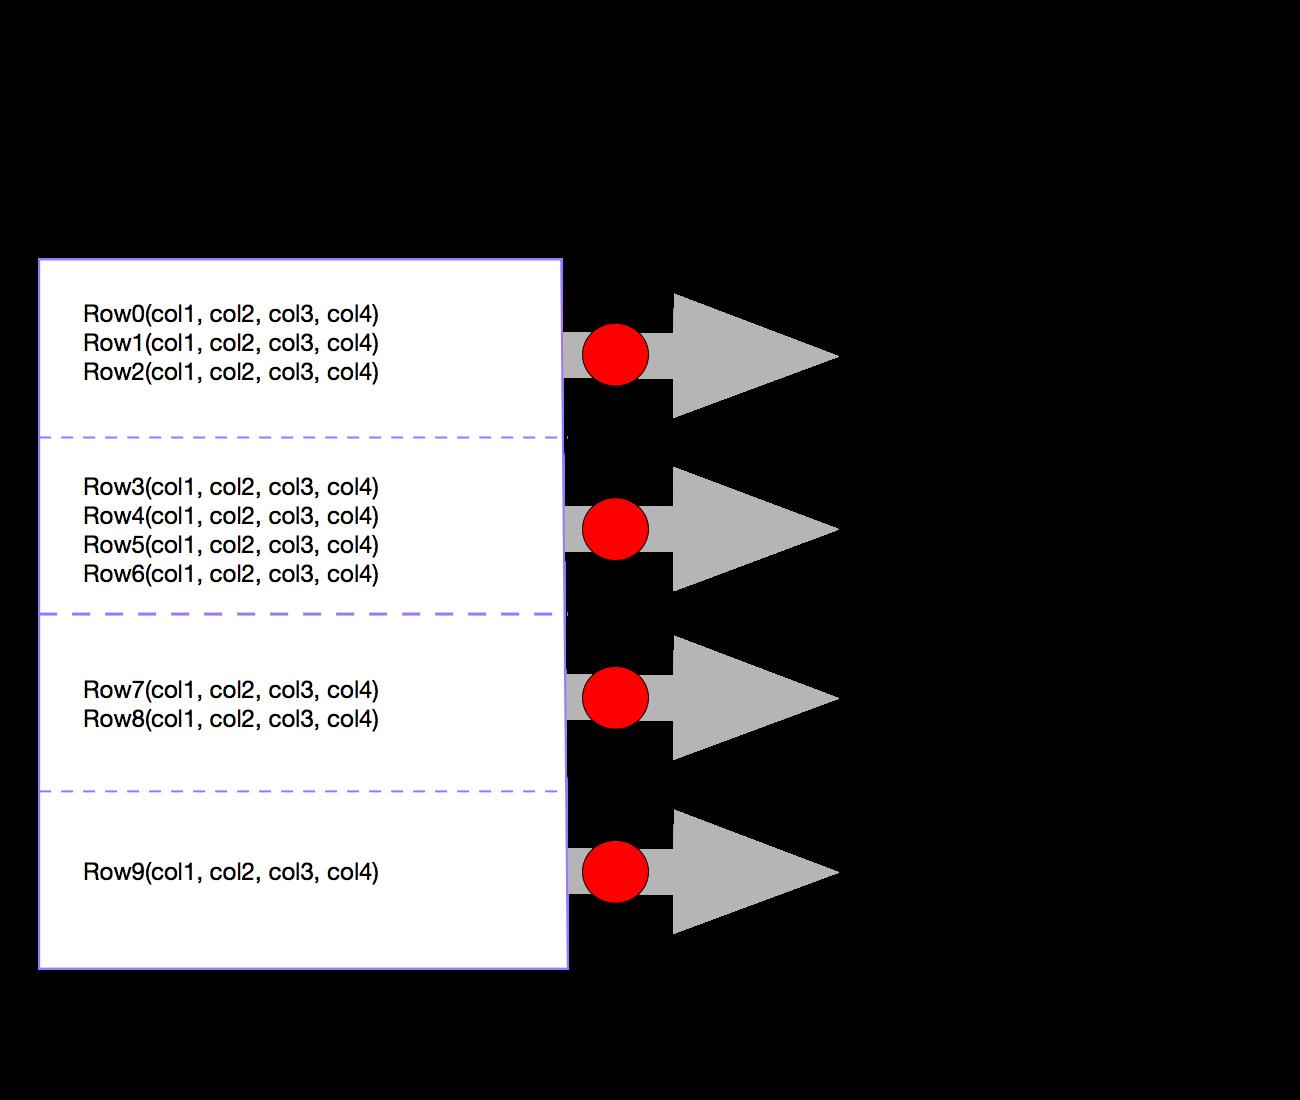 cs105_lab1a_spark_tutorial - Databricks